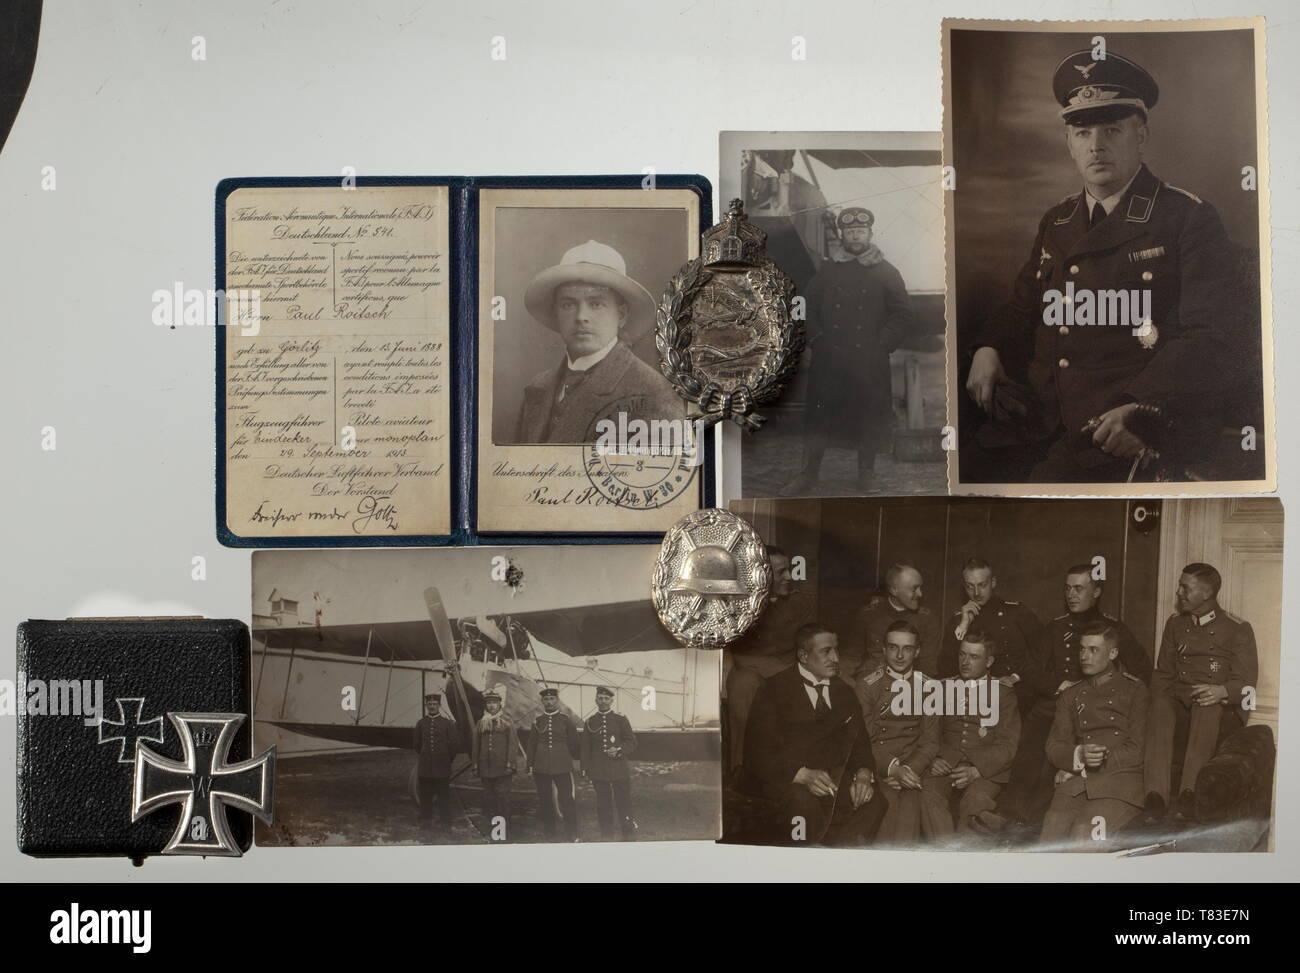 The estate of Paul Roitsch - Field Aviation Detachments 35